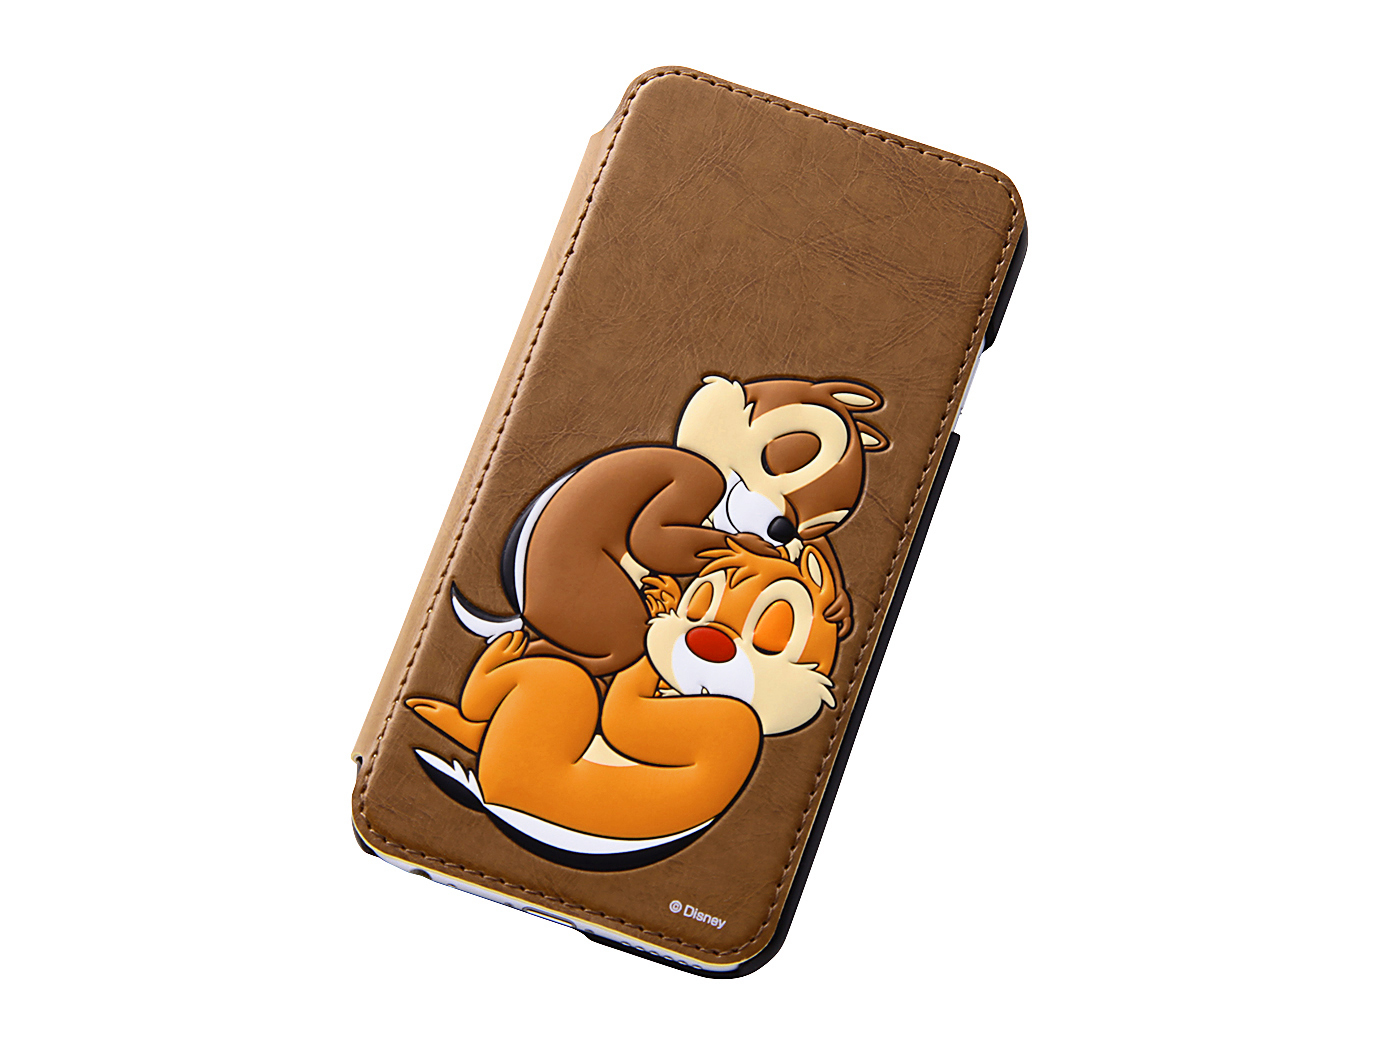 Iphone 6s 6 アイフォン シックスエス シックス用 総合通販サイト